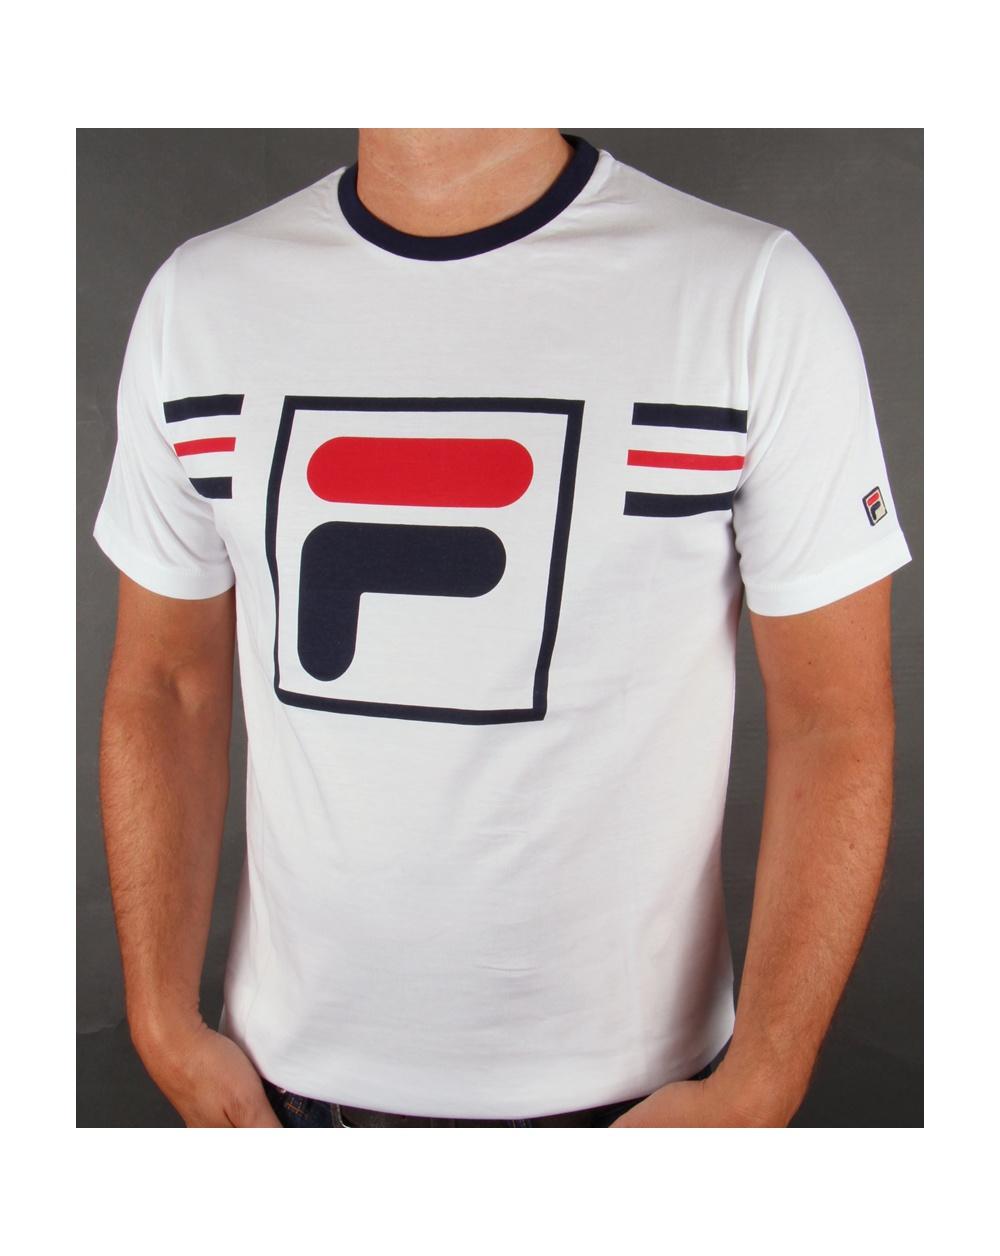 fila vintage gimondo t shirt white navy red crew neck logo tee white. Black Bedroom Furniture Sets. Home Design Ideas